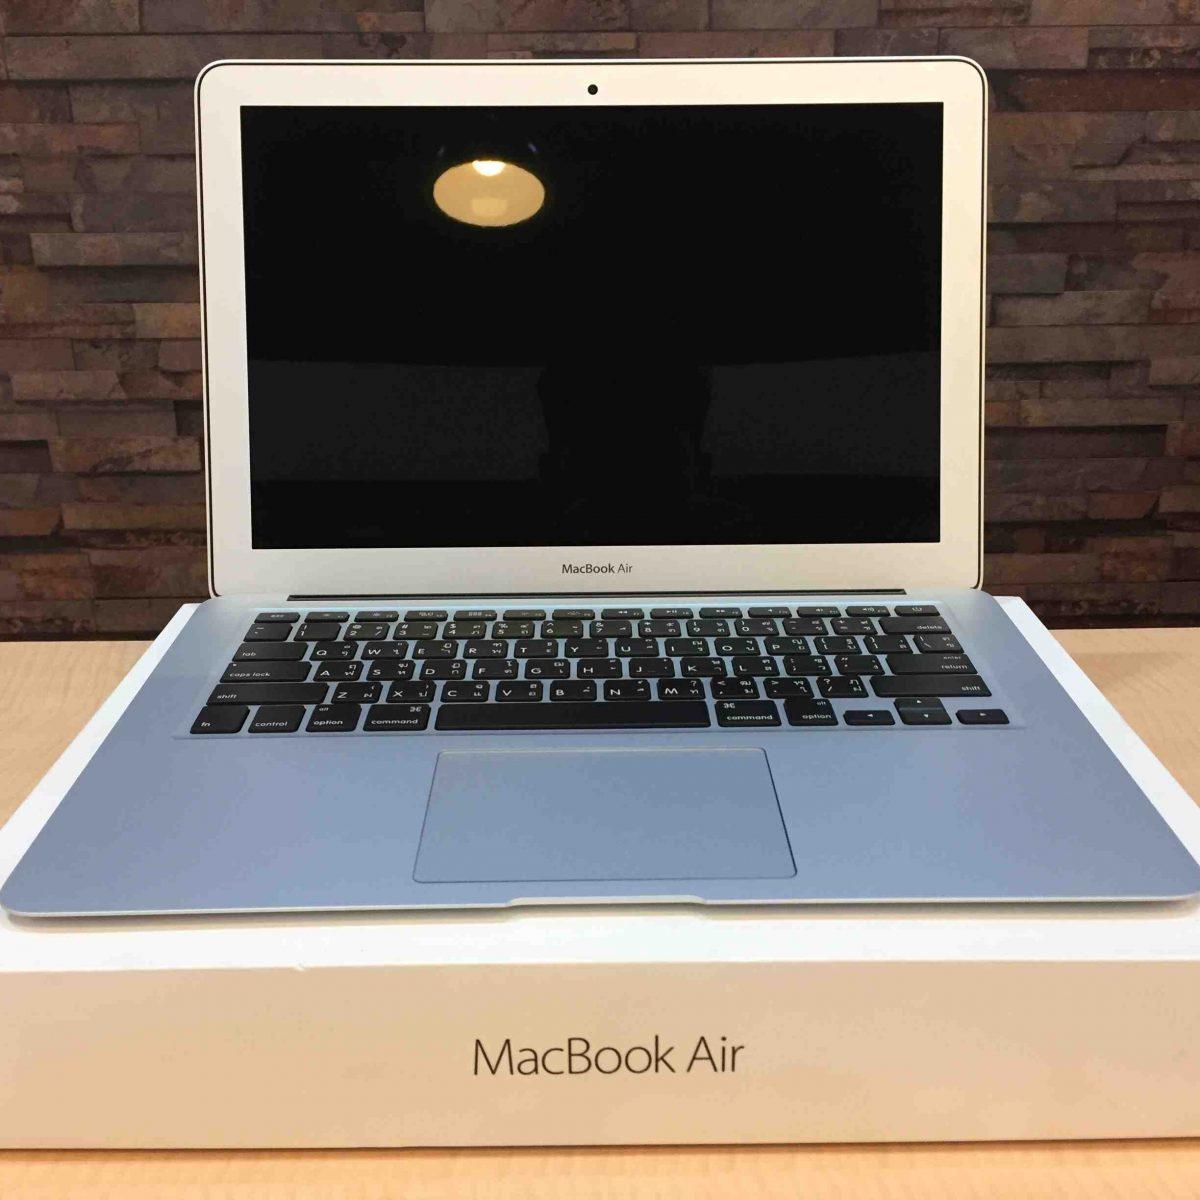 MacBook Air - Apple Support